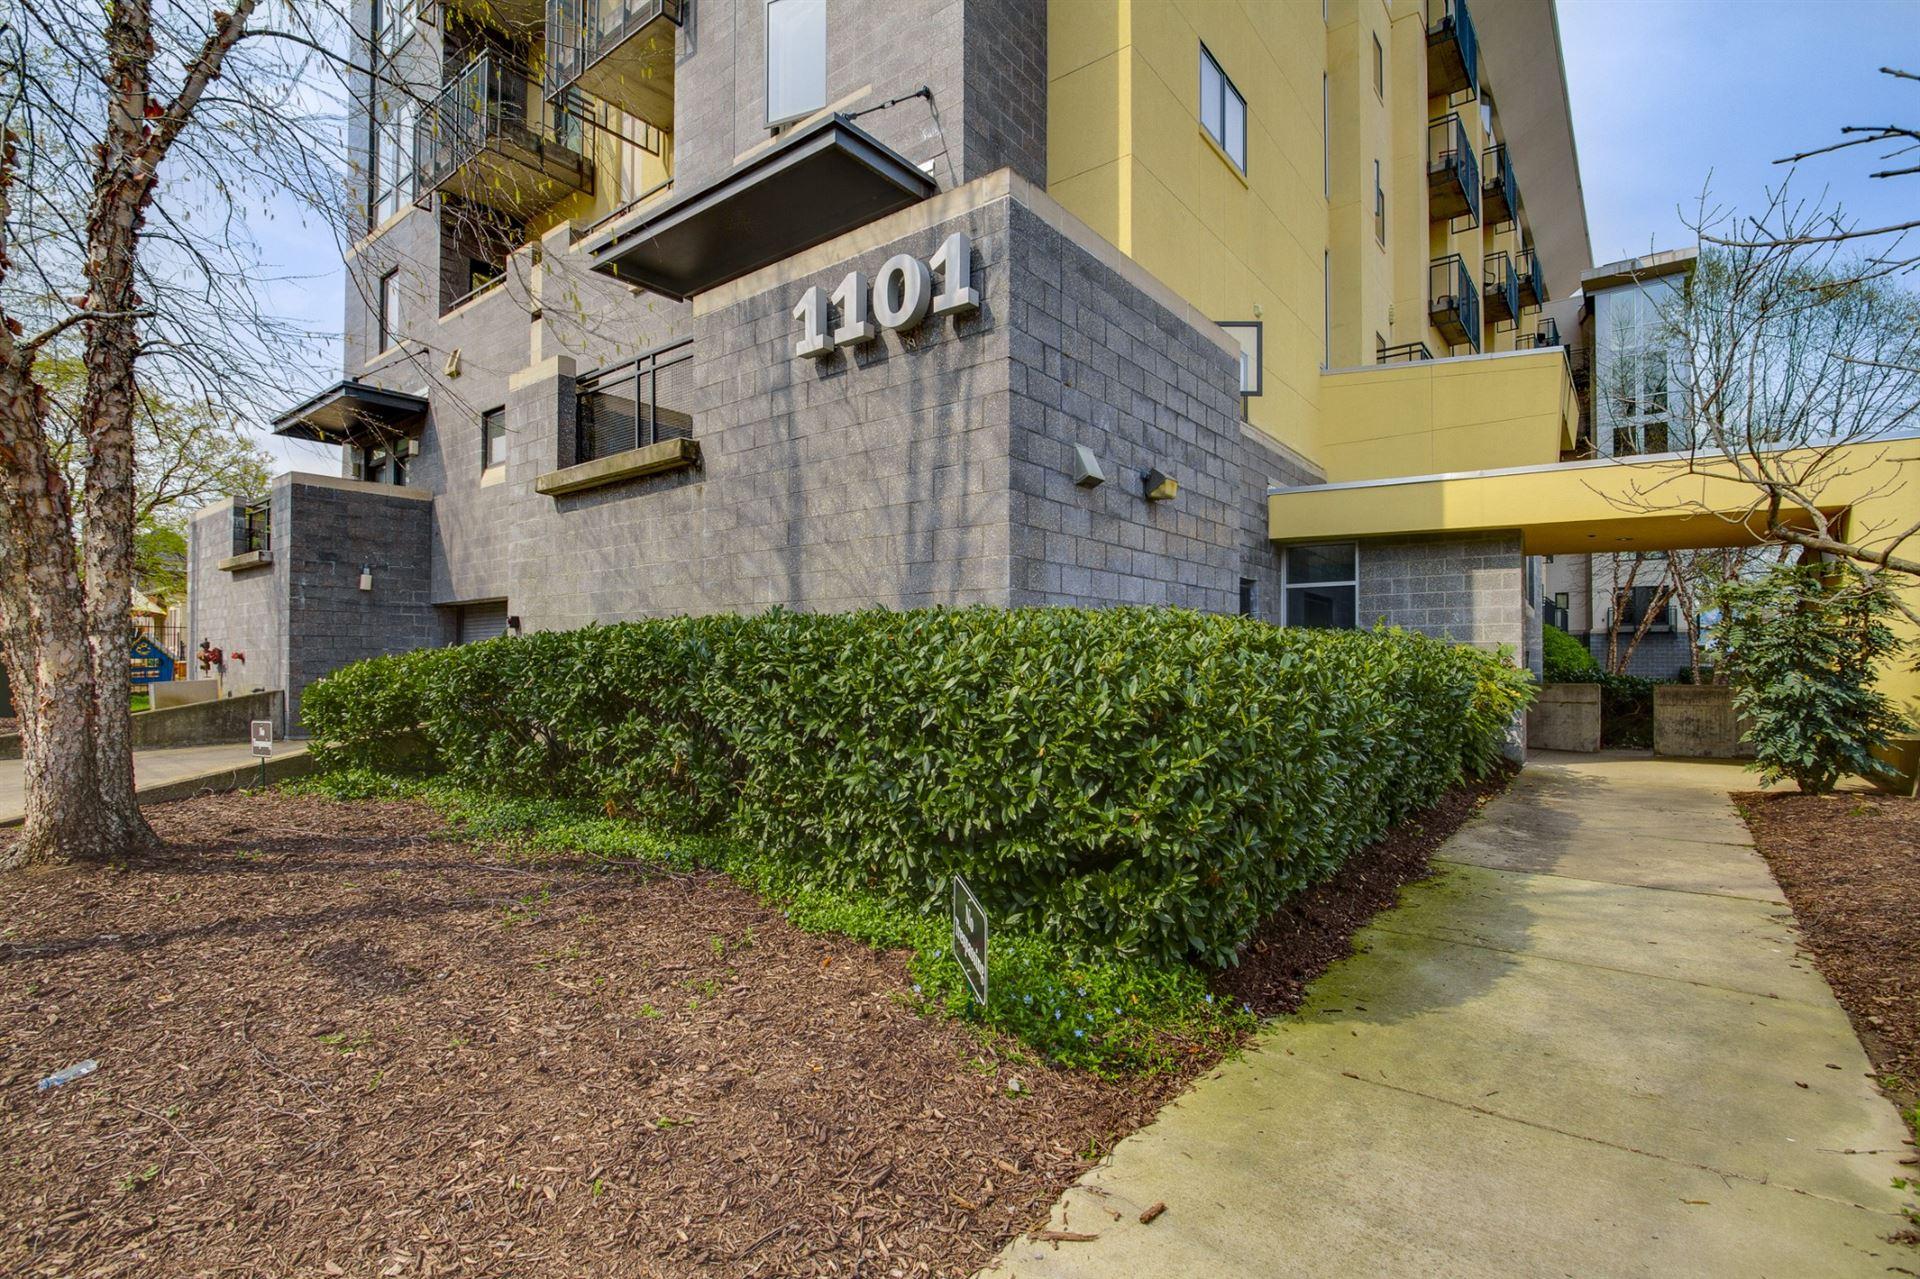 Photo of 1101 18th Ave, S #604, Nashville, TN 37212 (MLS # 2136776)